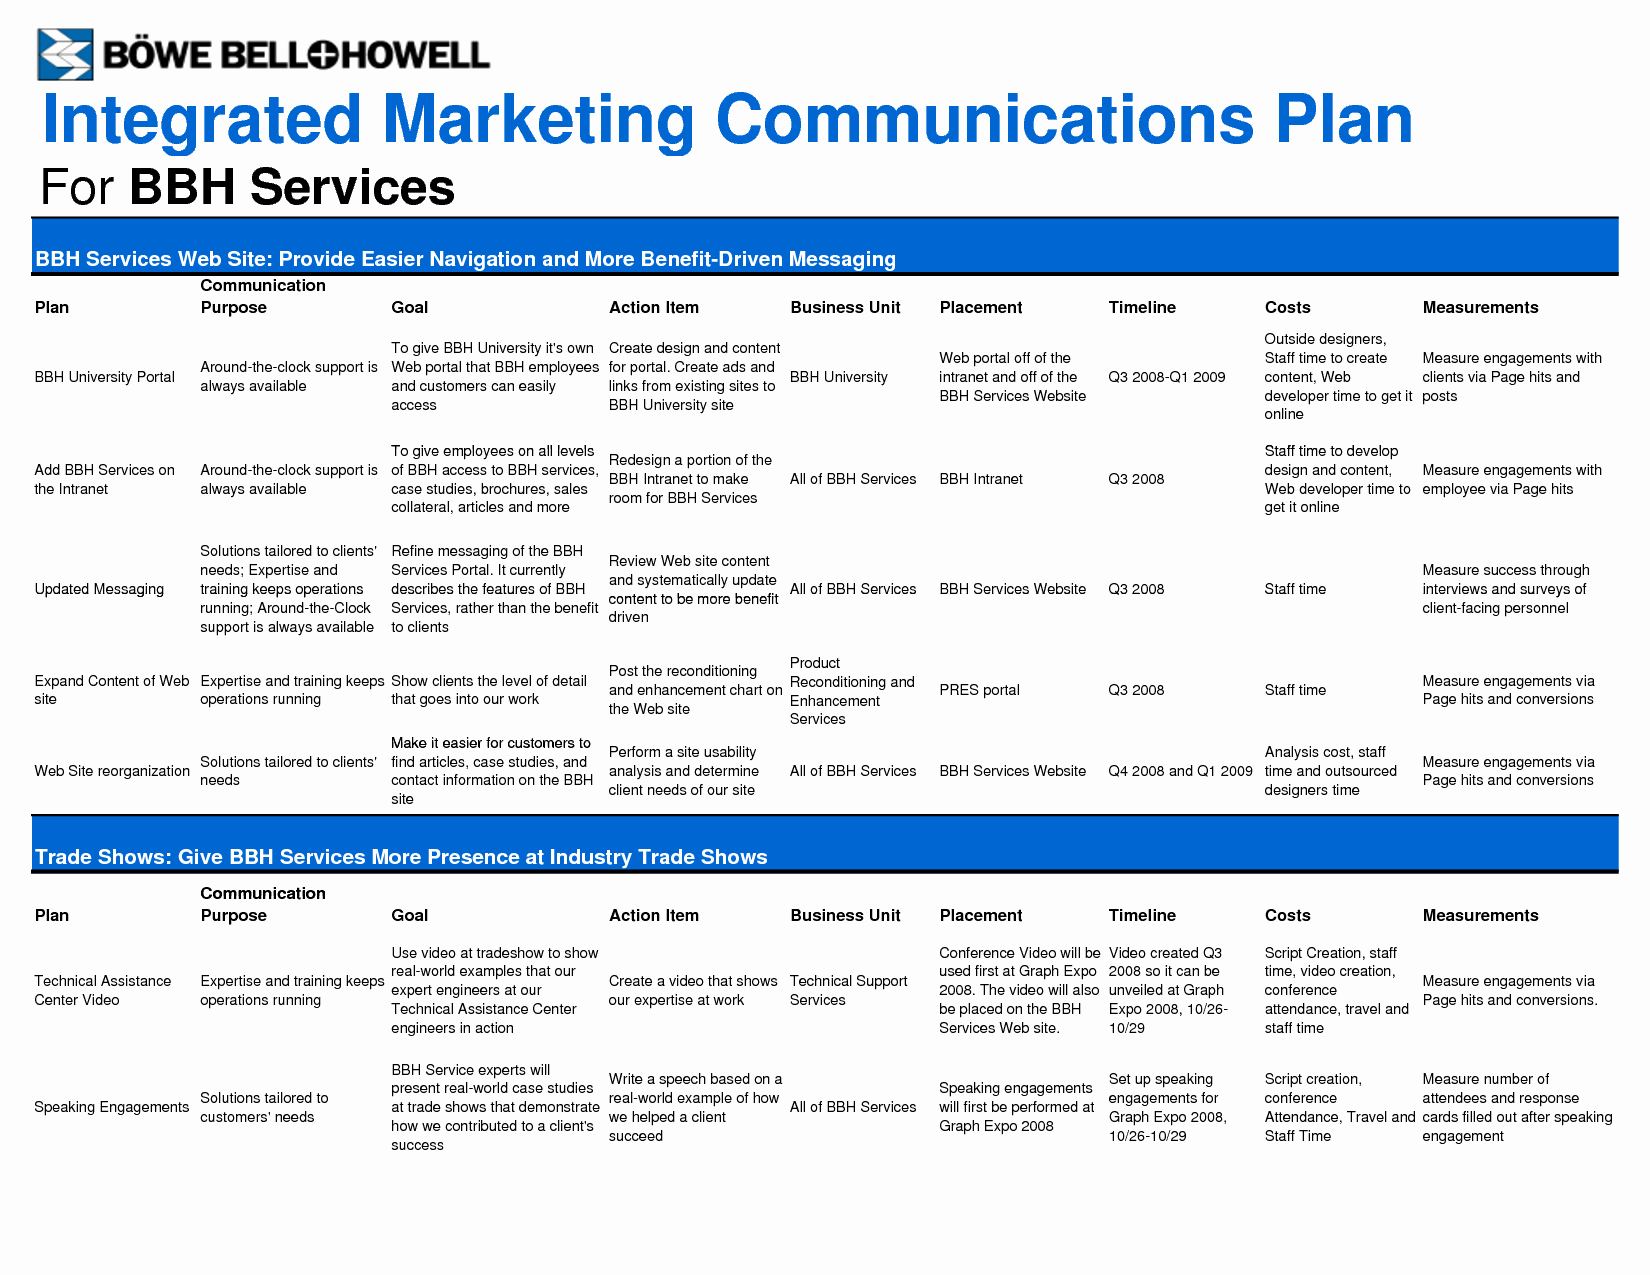 Marketing Communications Plan Template Inspirational Marketing Plan Template Google Search